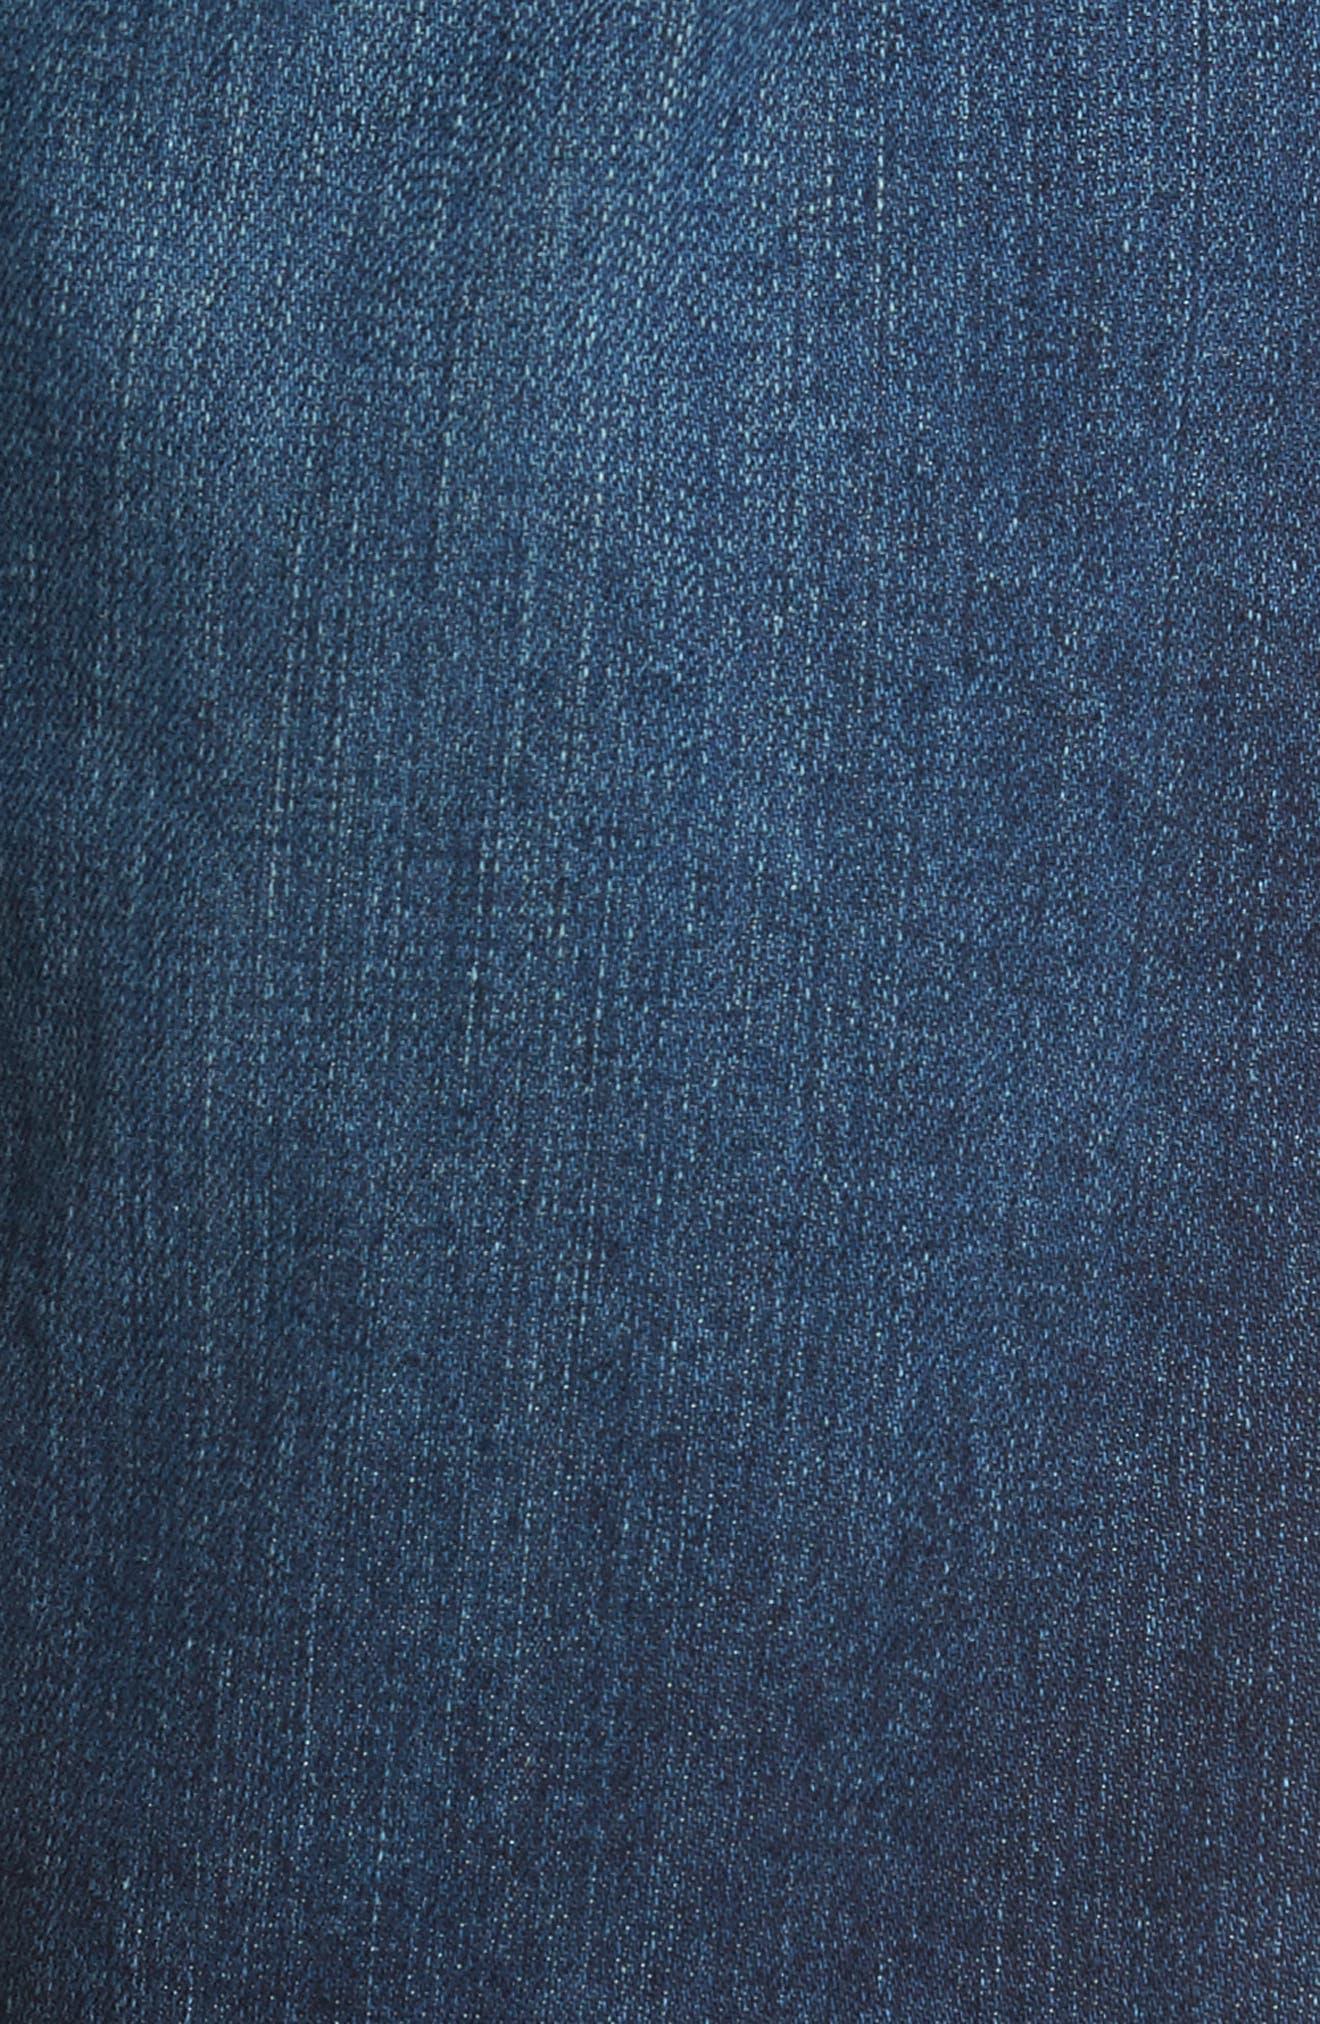 Ives Straight Leg Jeans,                             Alternate thumbnail 5, color,                             478